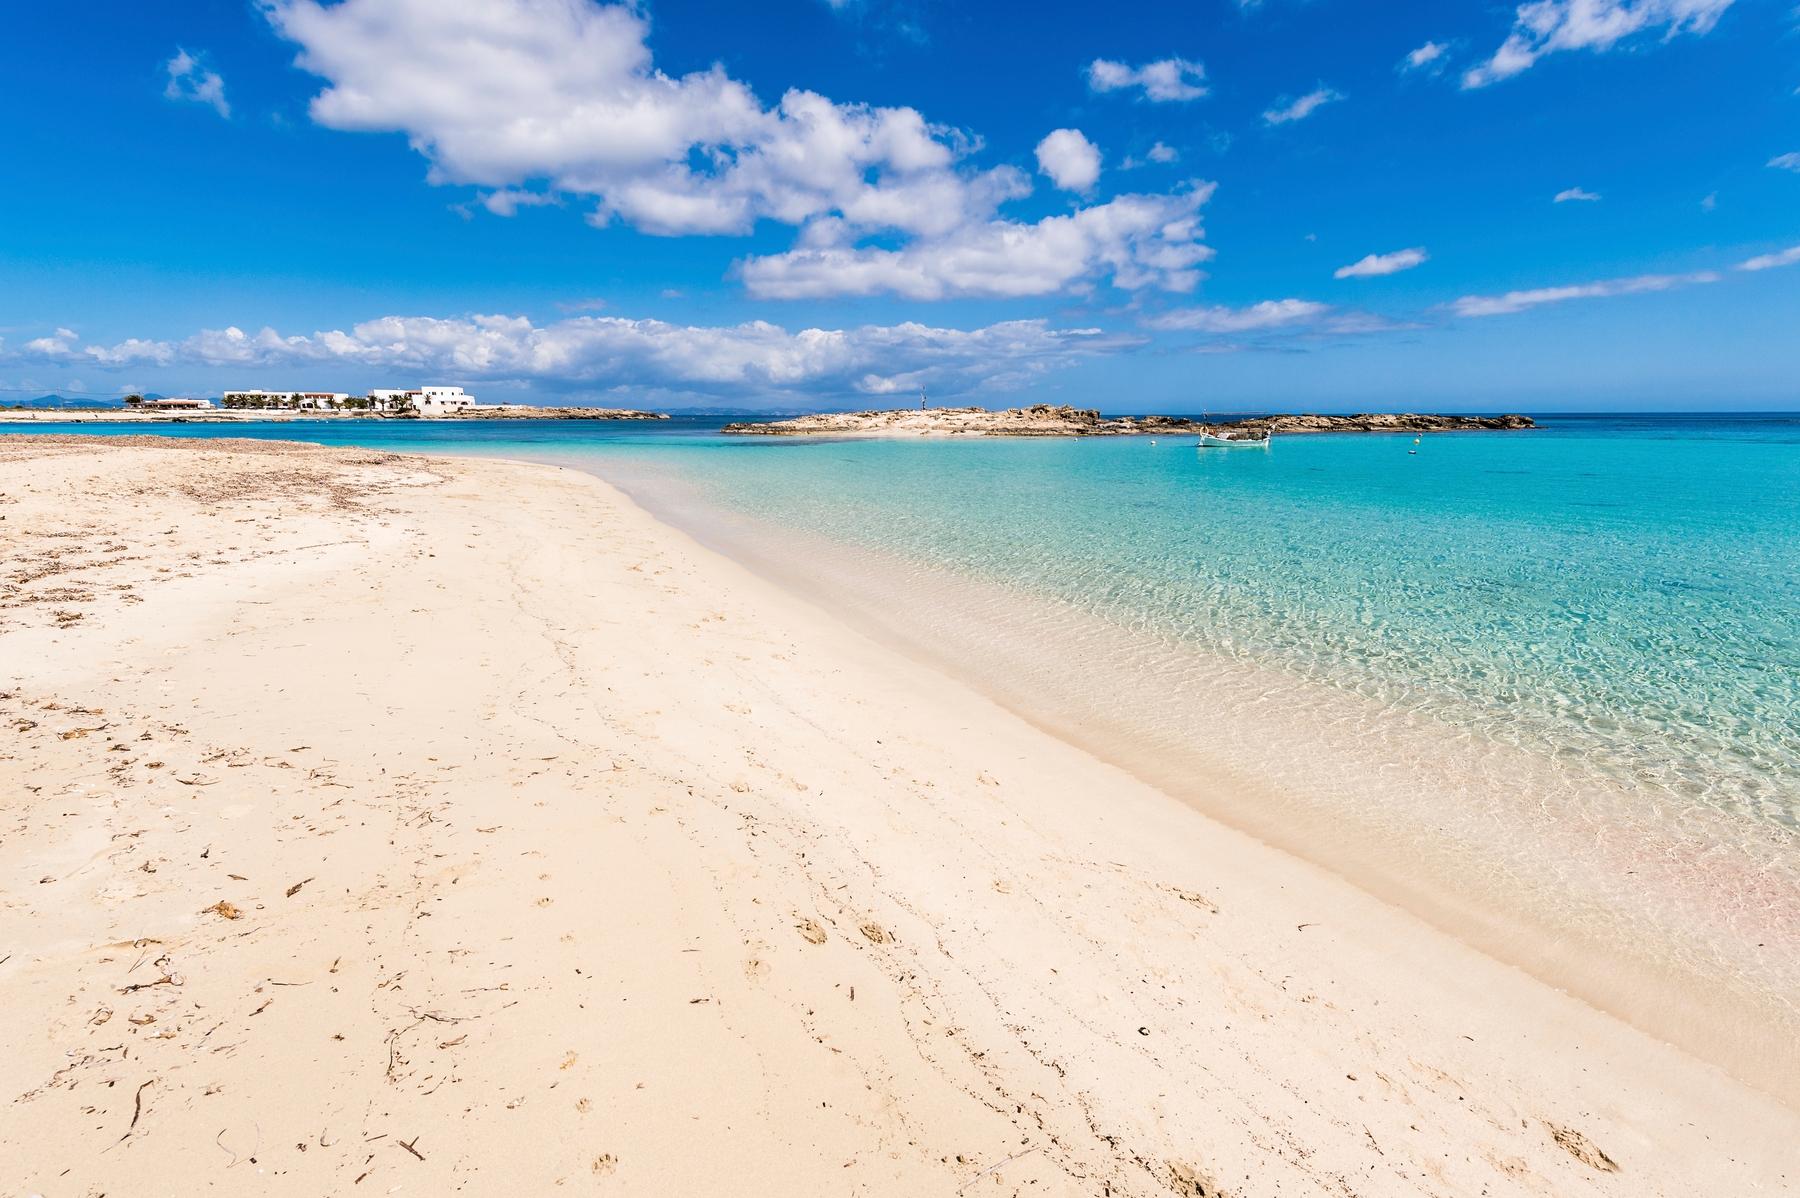 Spiagge Formentera: Cala Saona